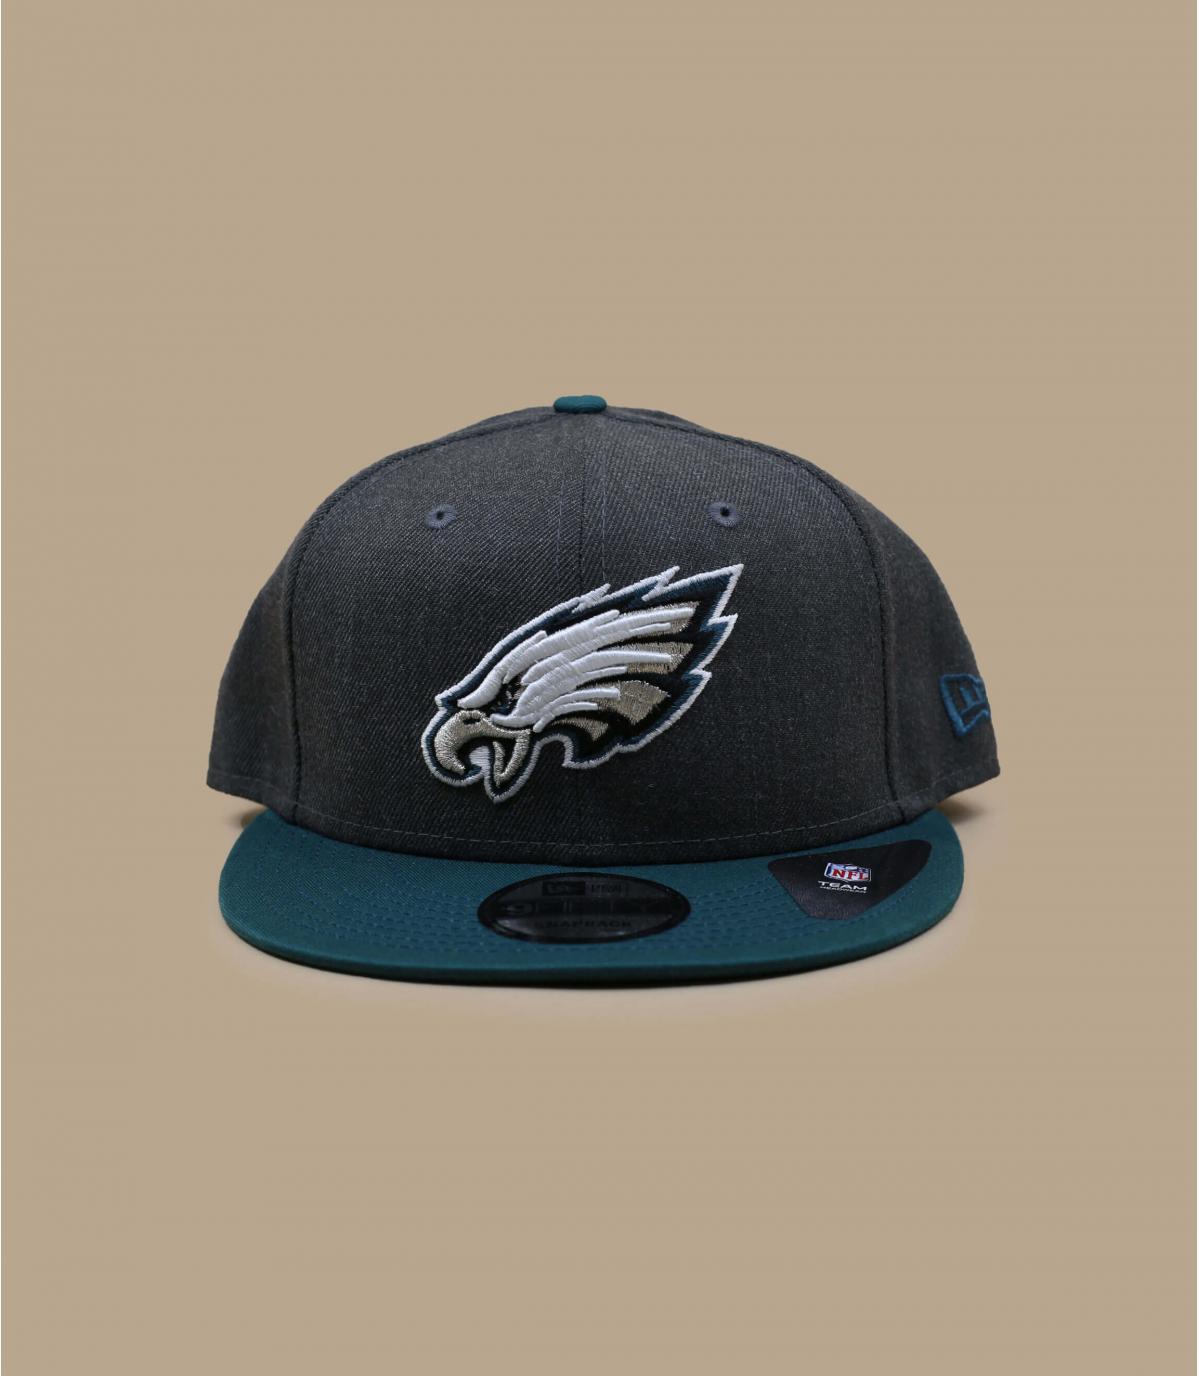 57decd6b0aa New Era grey cap - Buy online at Headict.